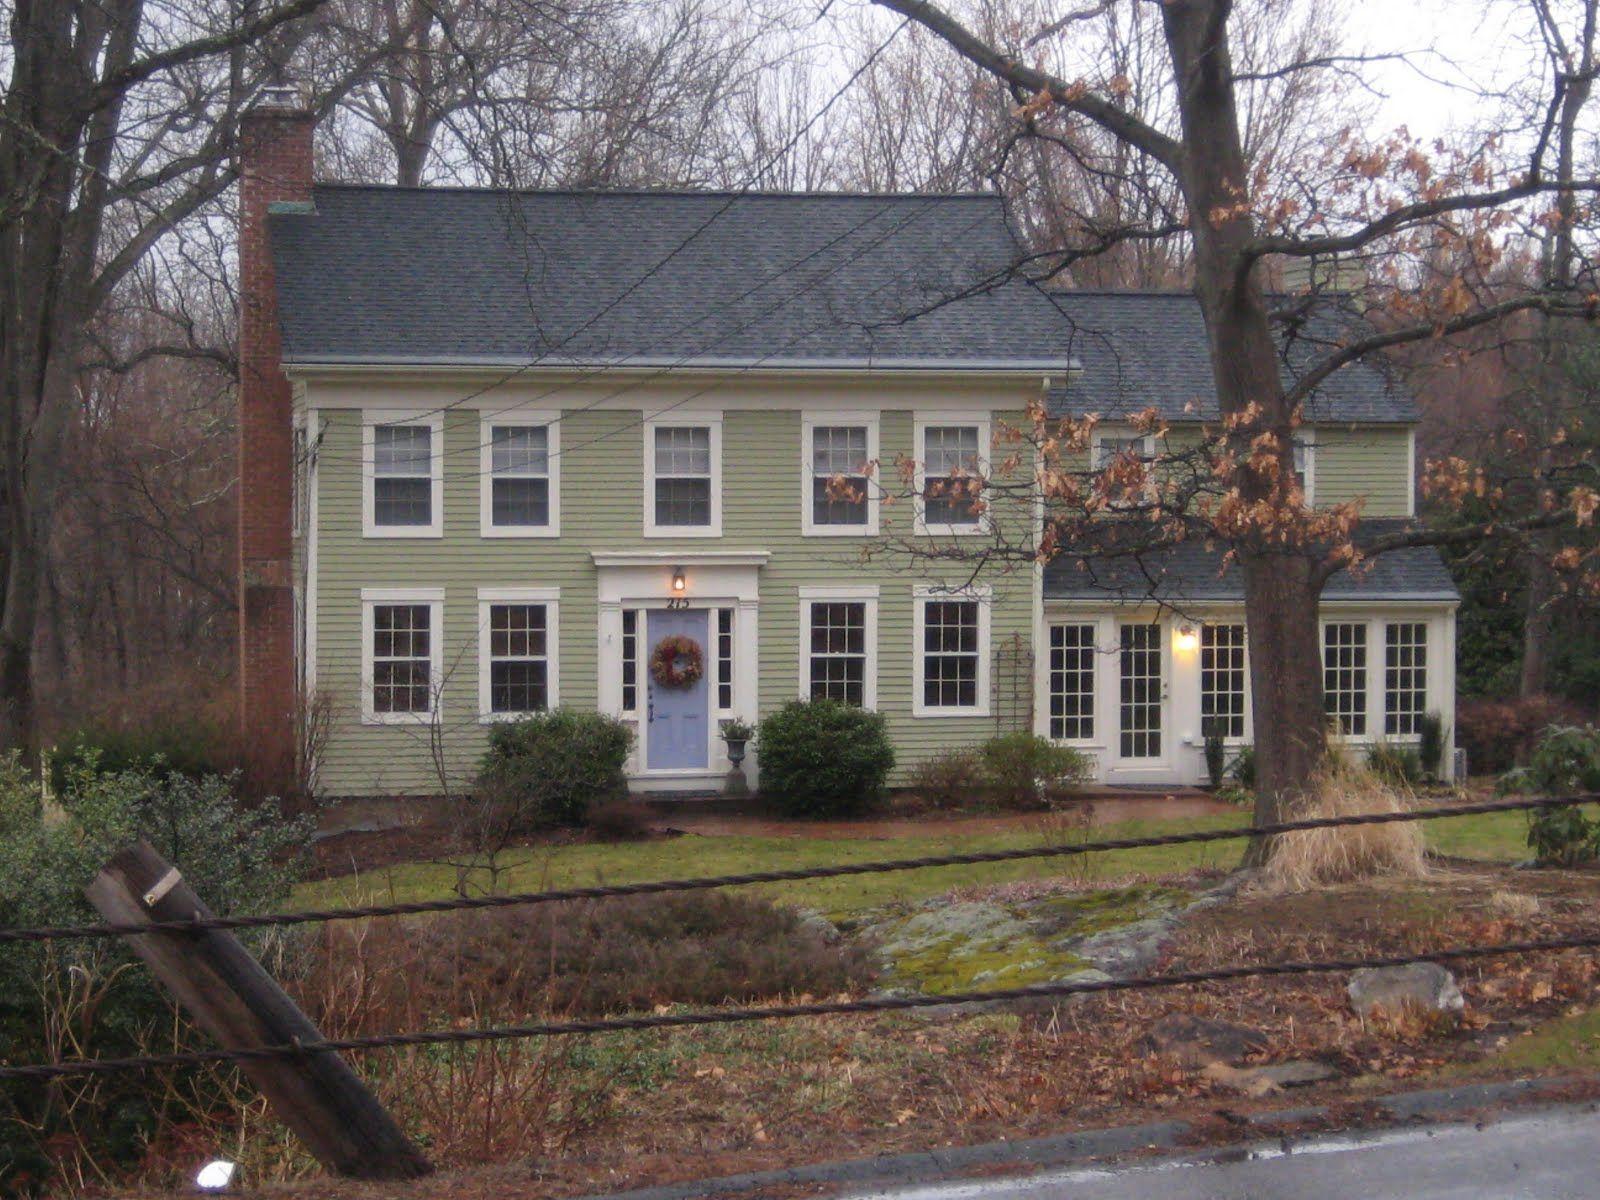 Ideas For Exterior House Colors House Paint Exterior Exterior House Colors Green House Color